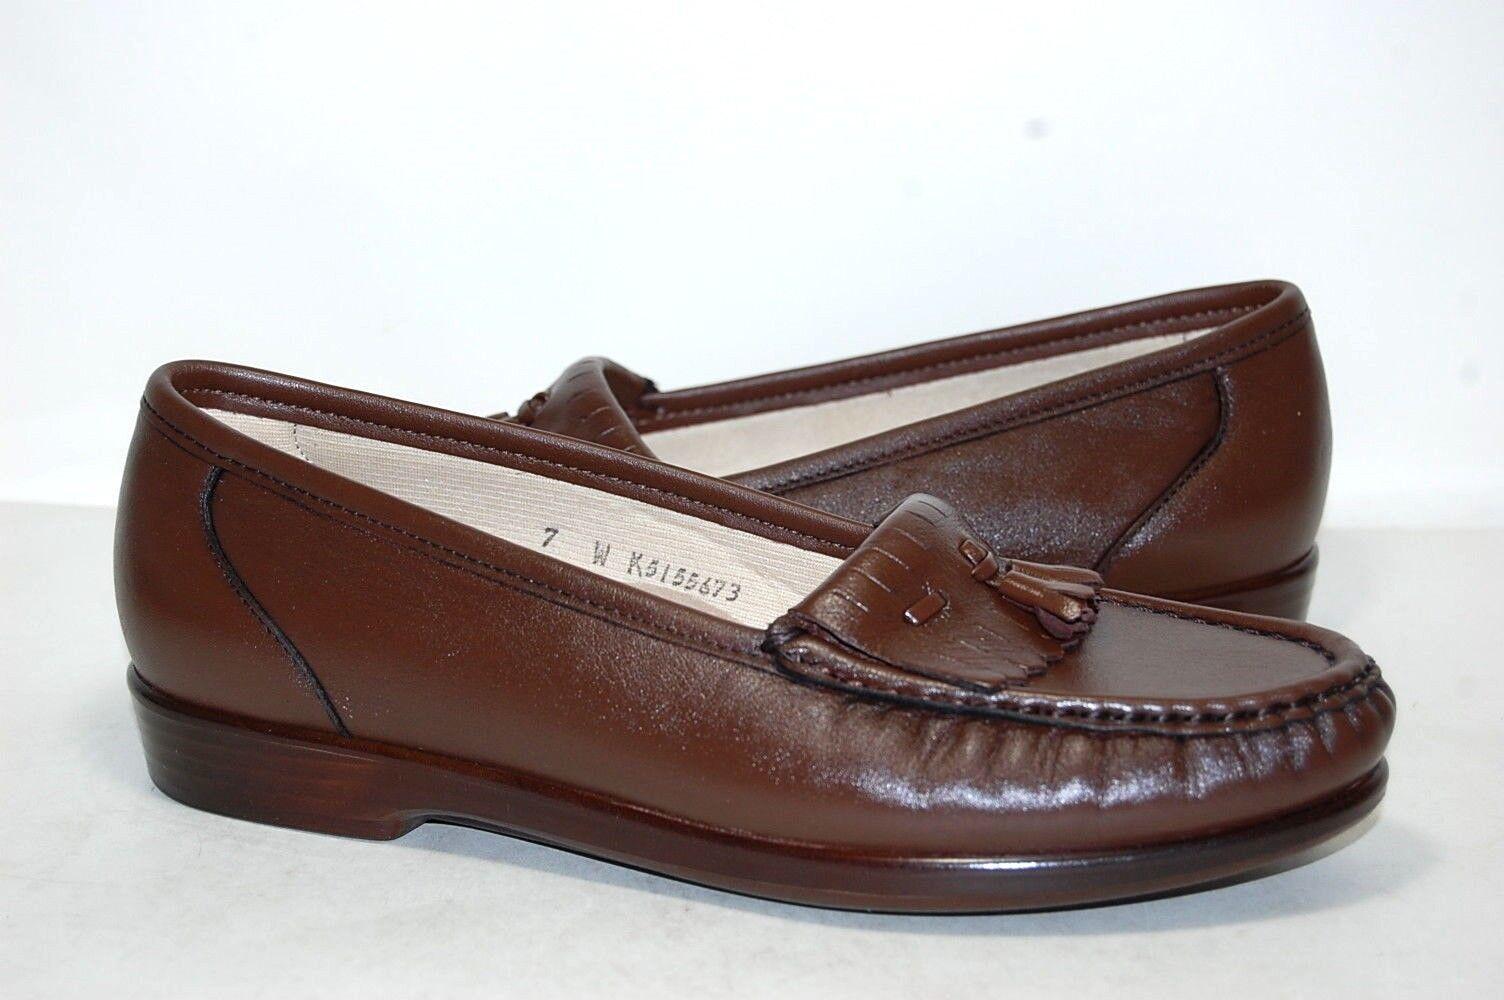 Original SAS Softie Antique Walnut Leather W Wide 0038-068 0038-068 0038-068 Women 89de33